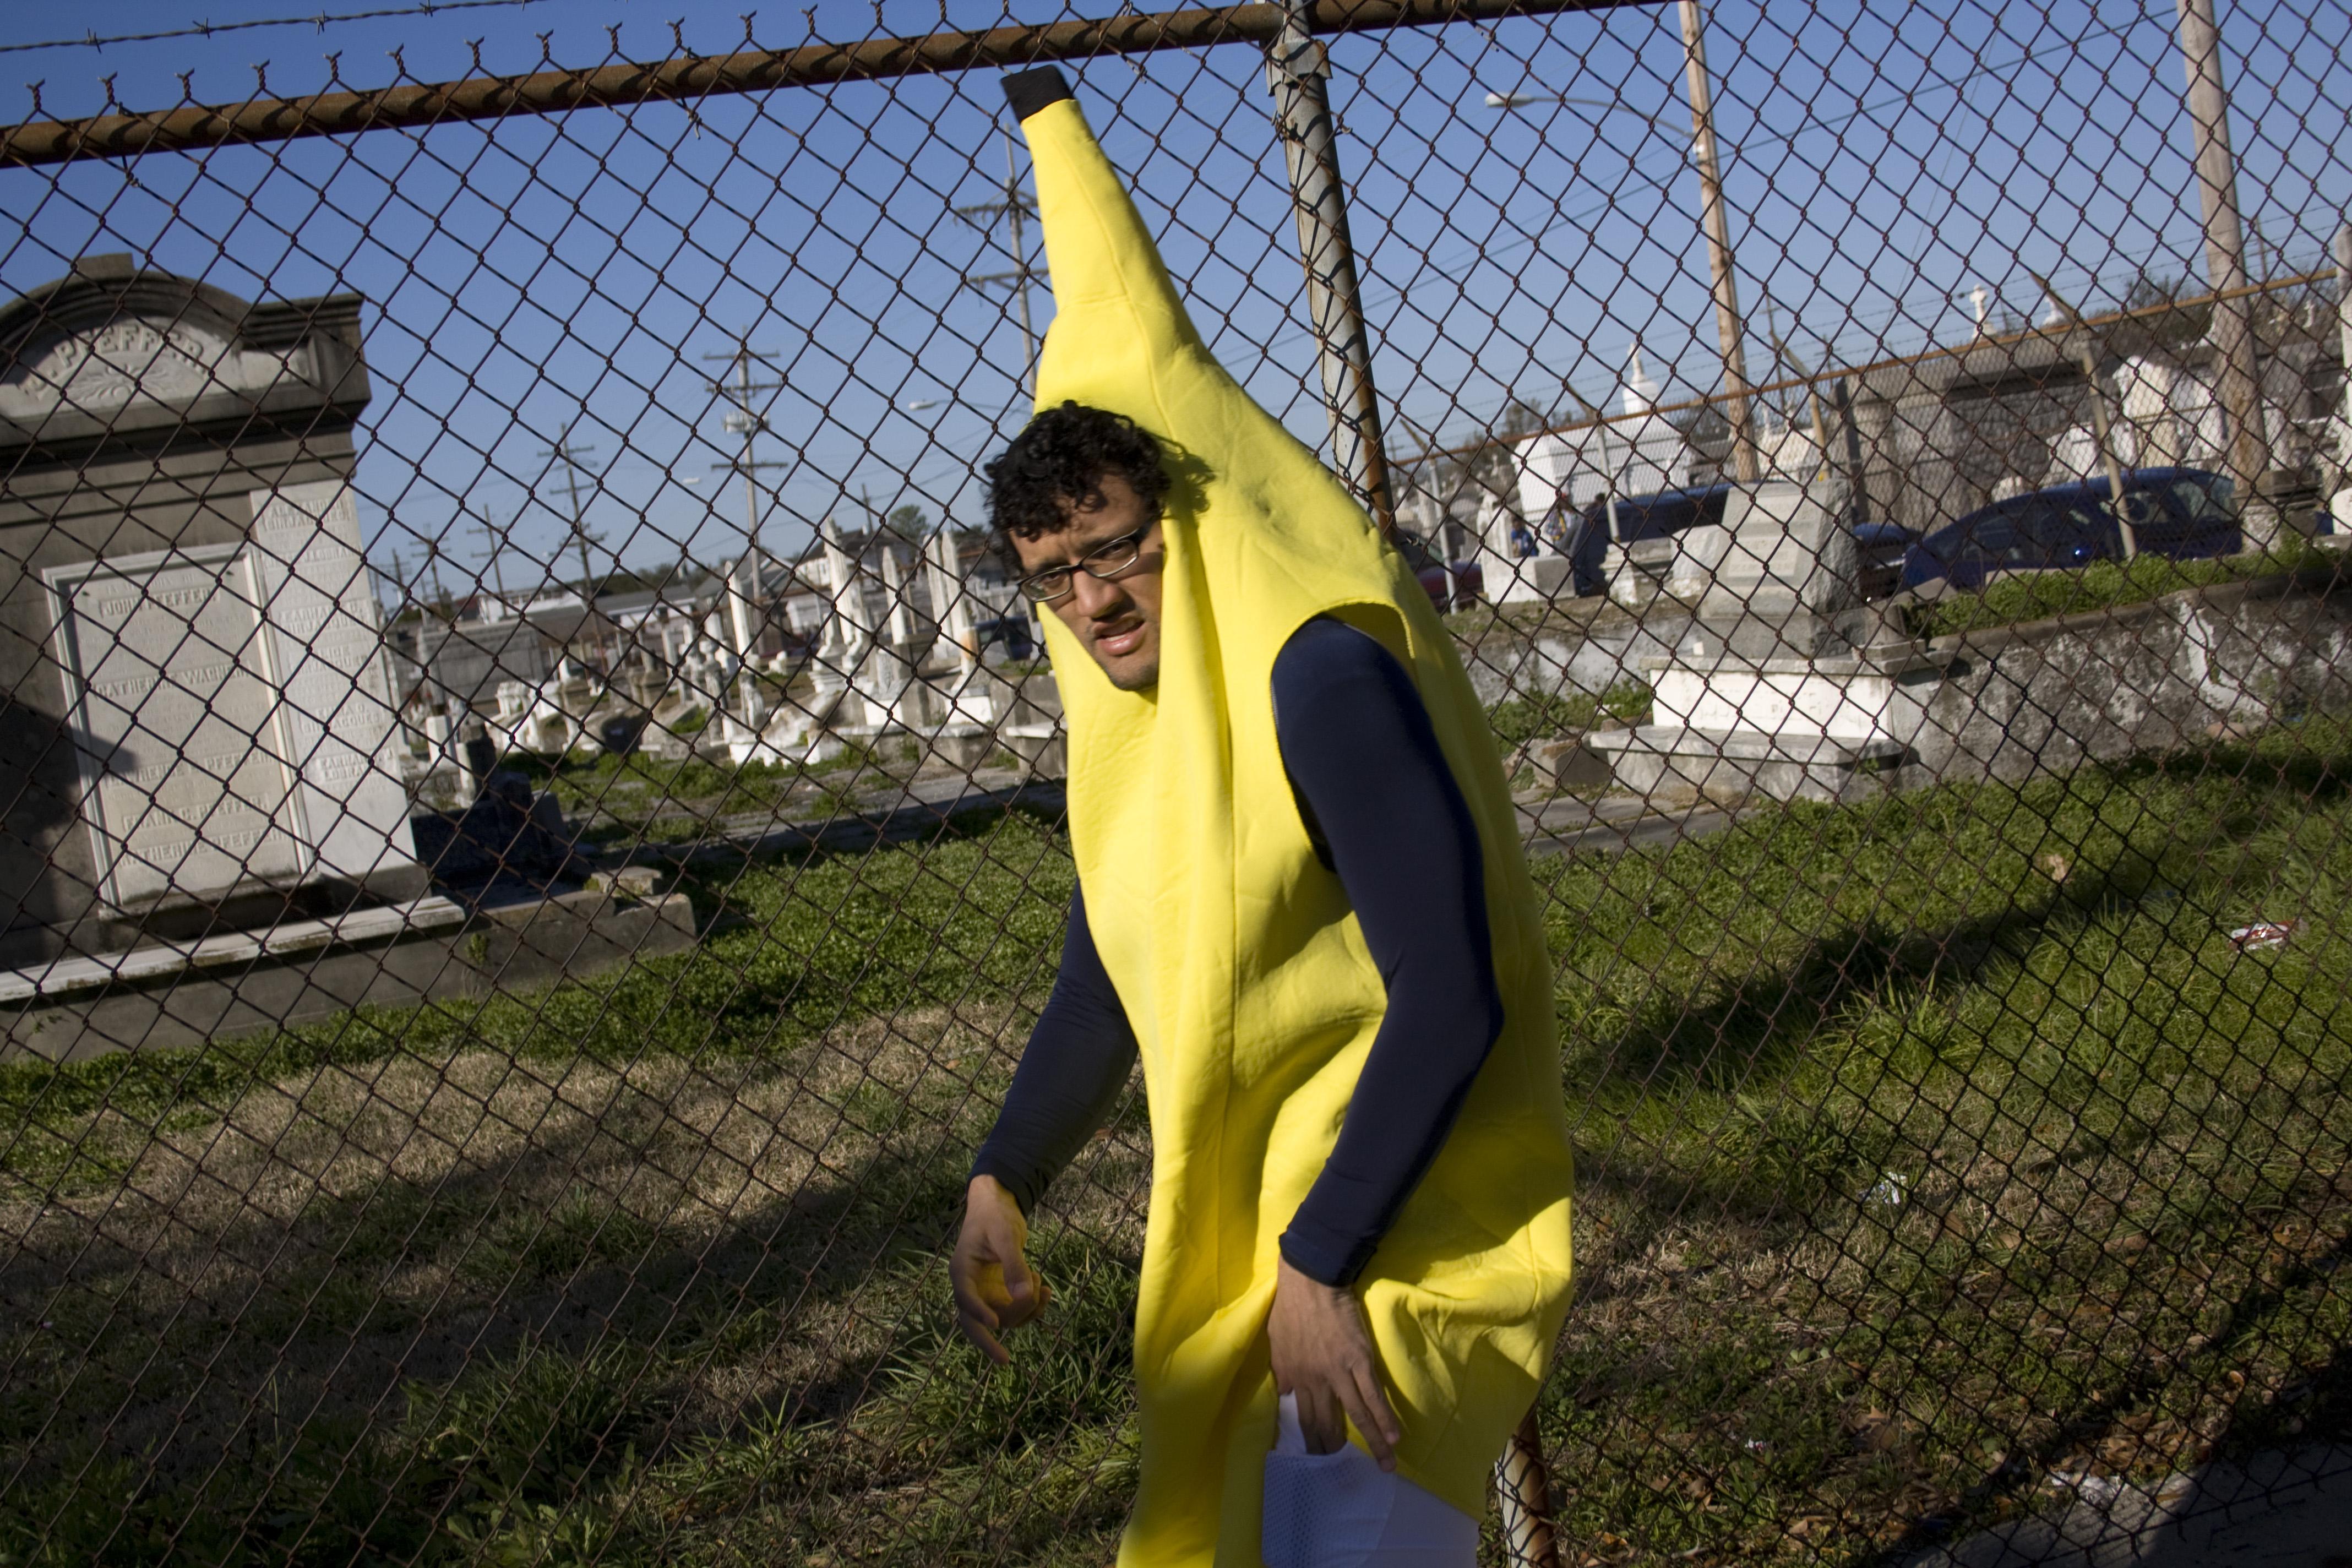 Banana hammock costume banana hammock swimsuit l bf4cd115fd7477b1